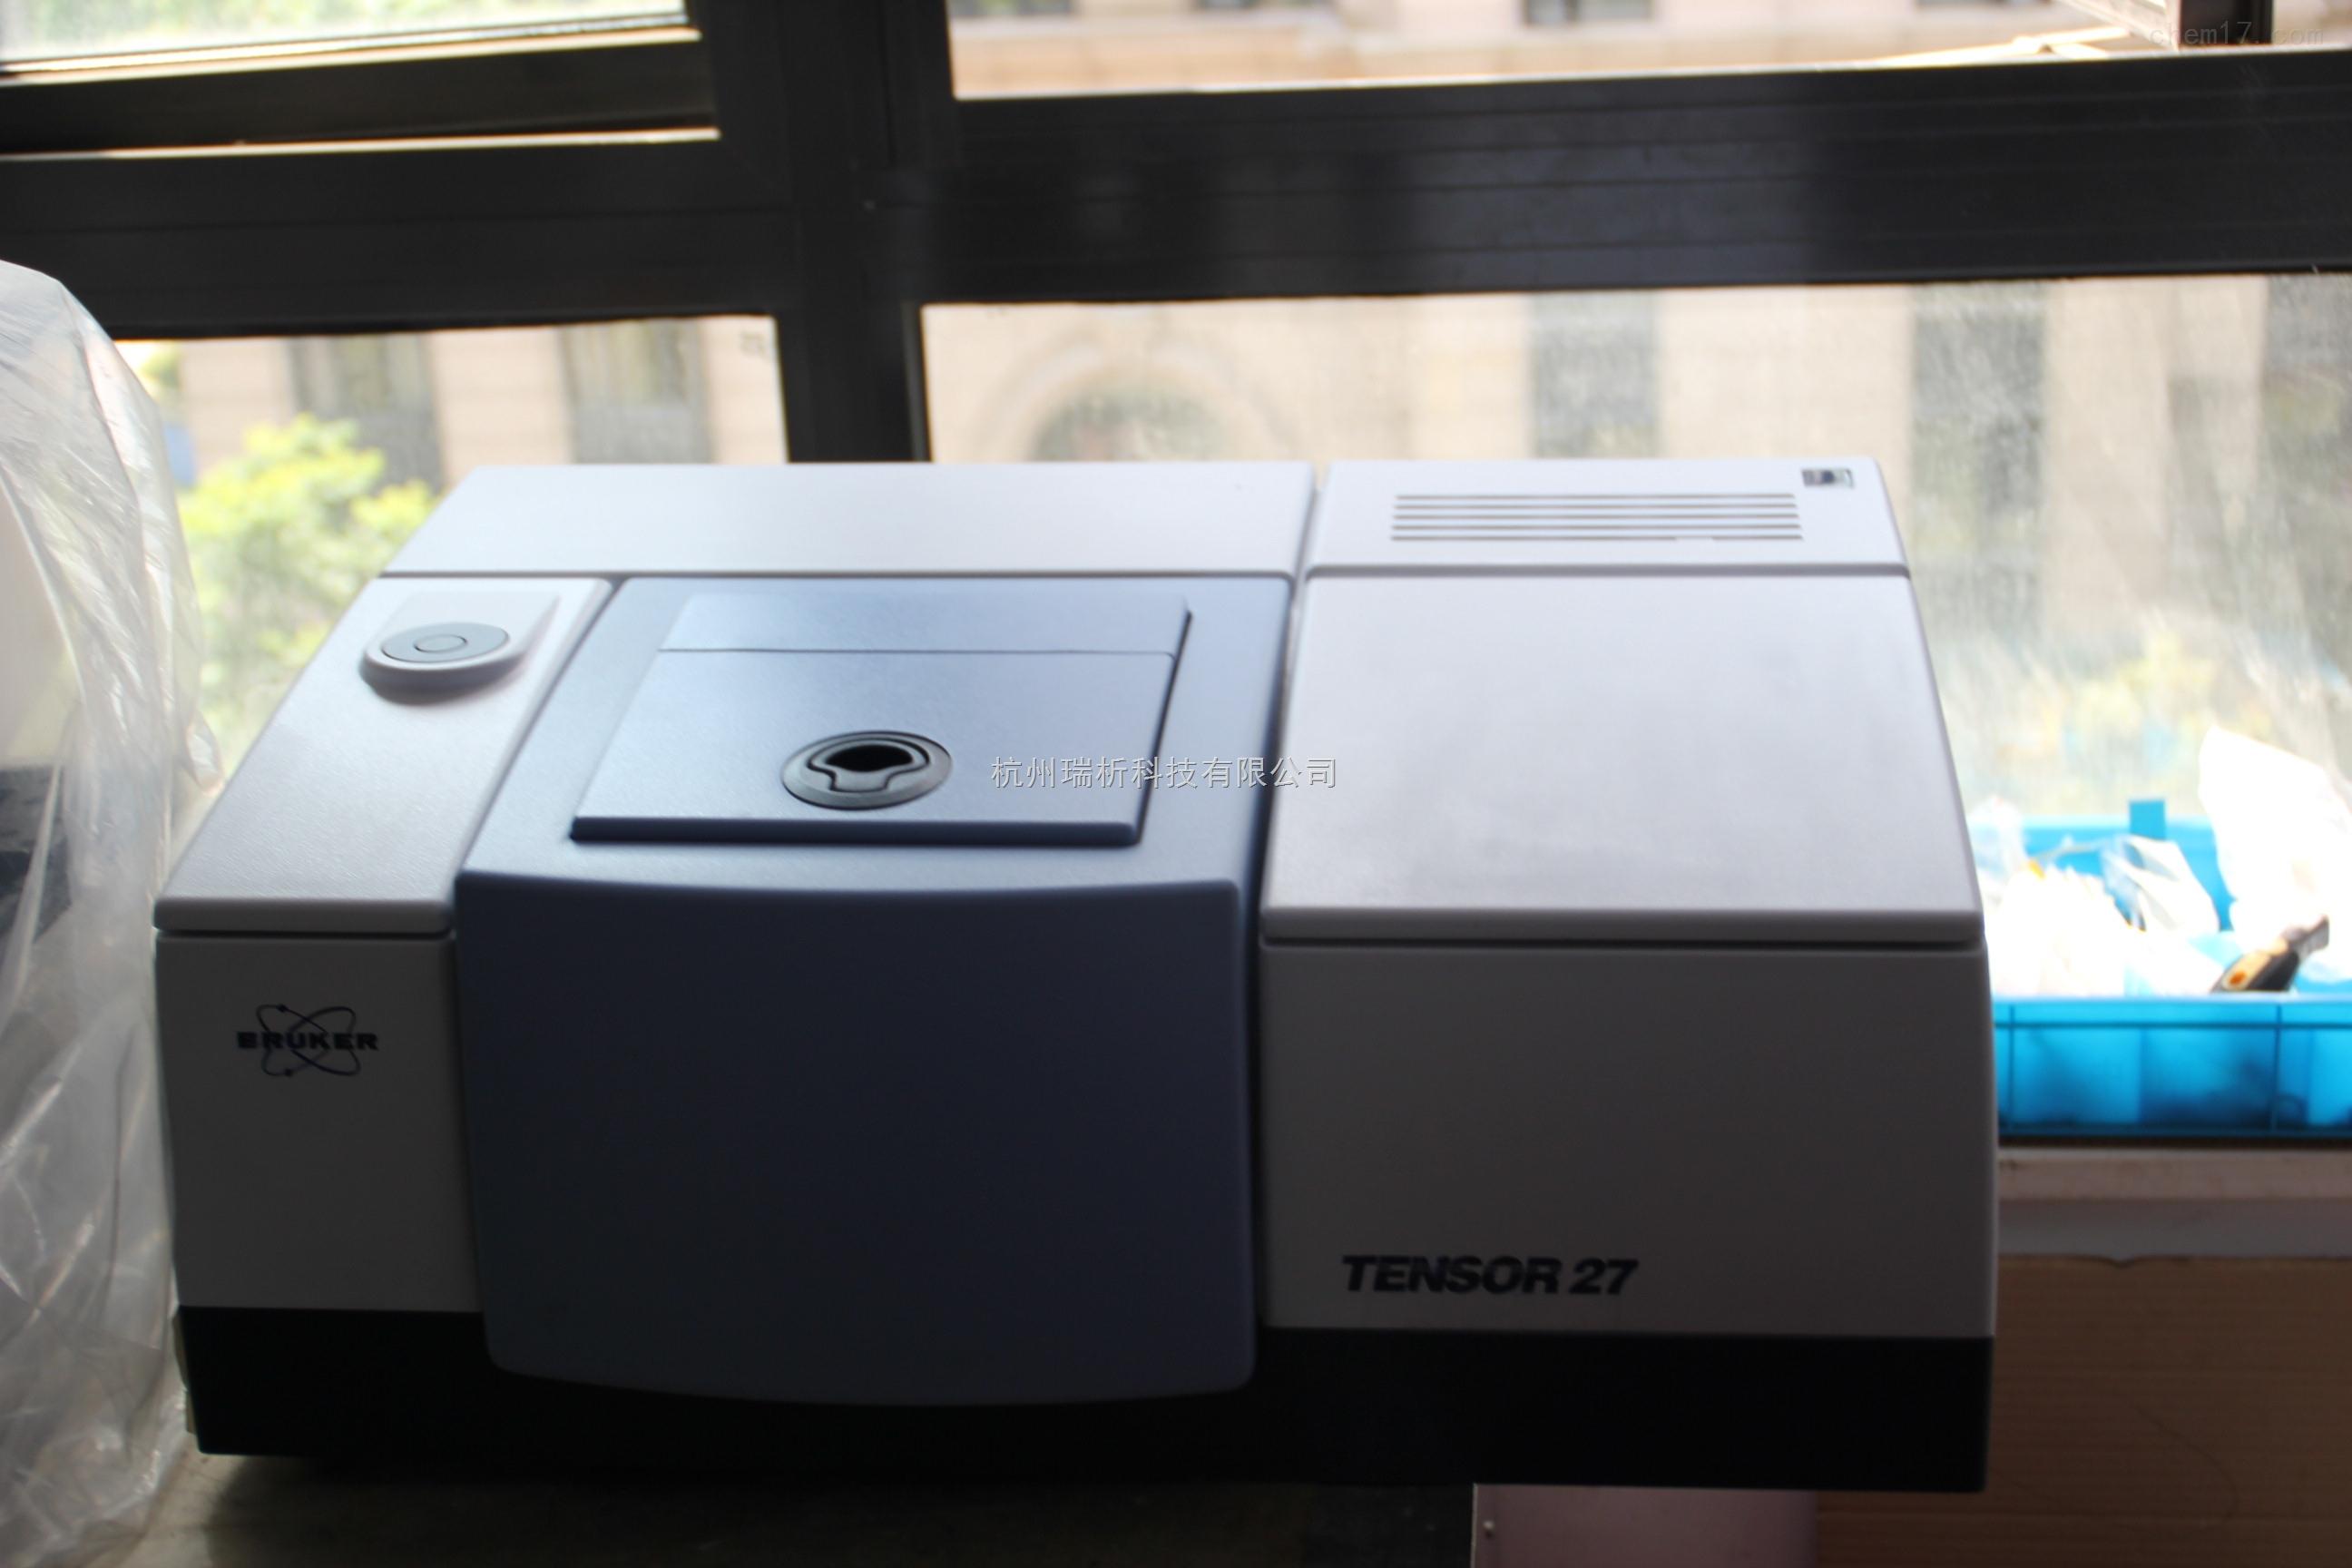 tensor27色谱柱液相色谱柱布鲁克红外tensor27